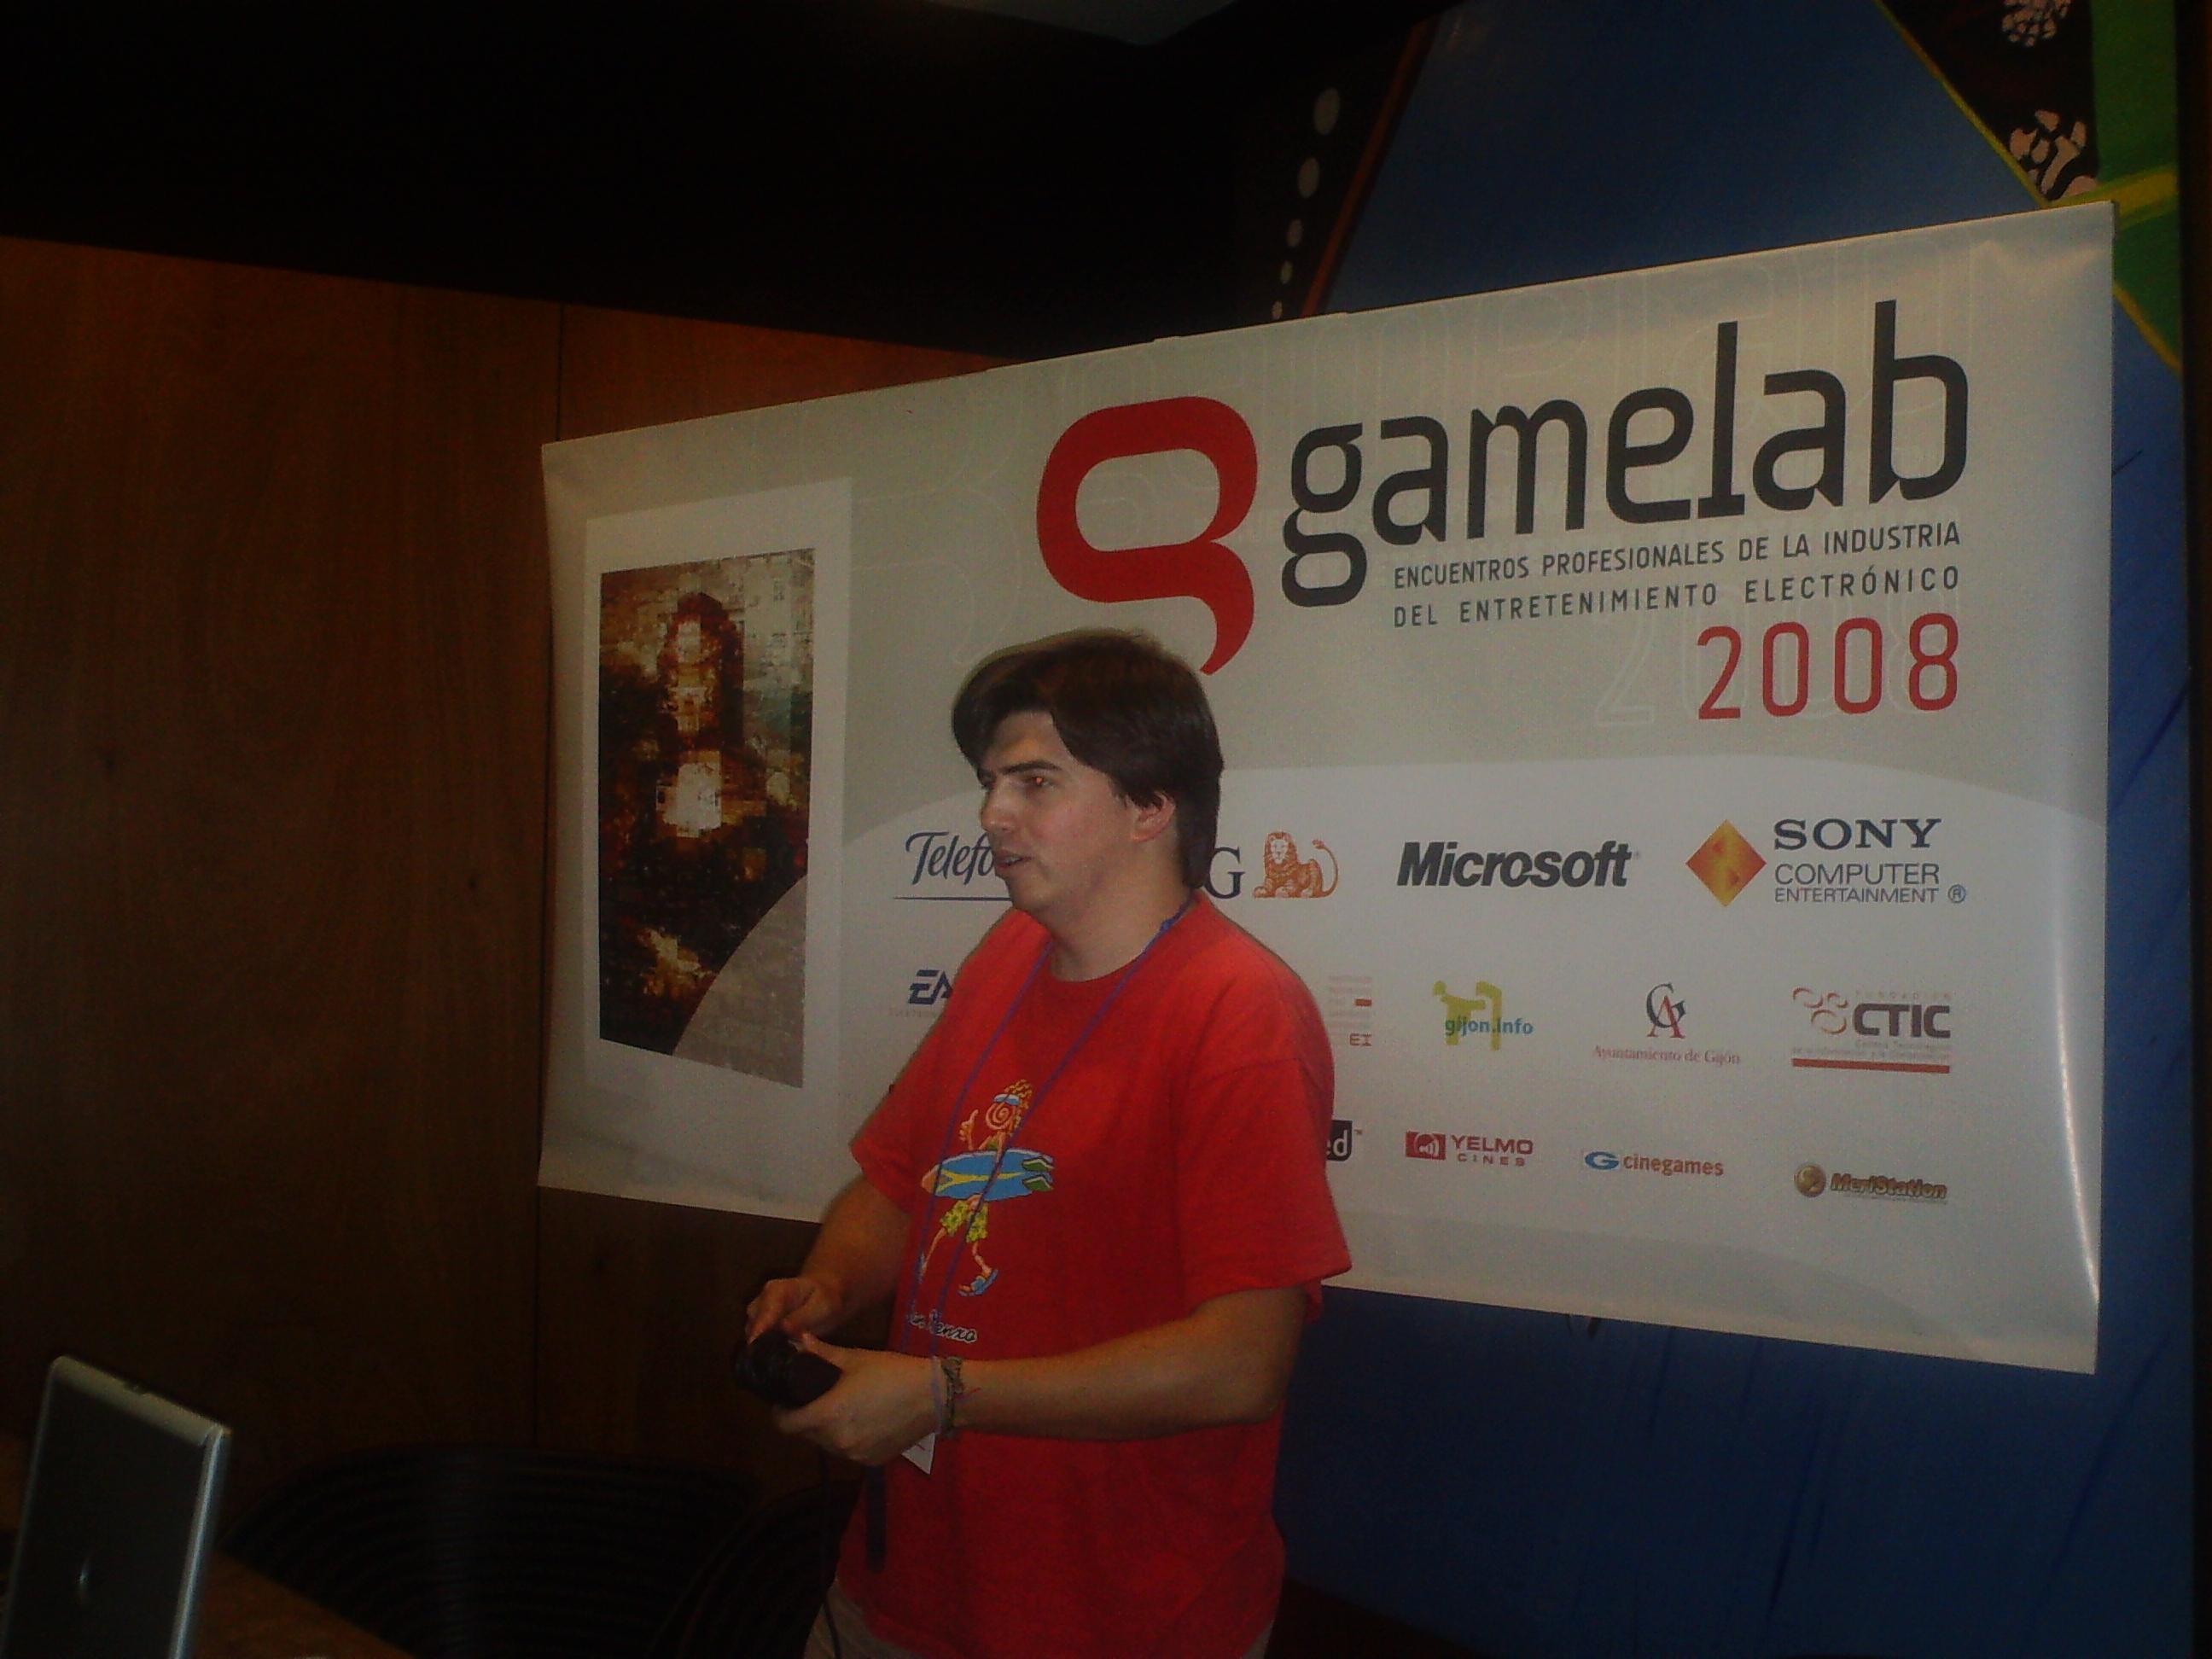 Unai Landa, Digital Legends, en Gamelab 2008. Gijón